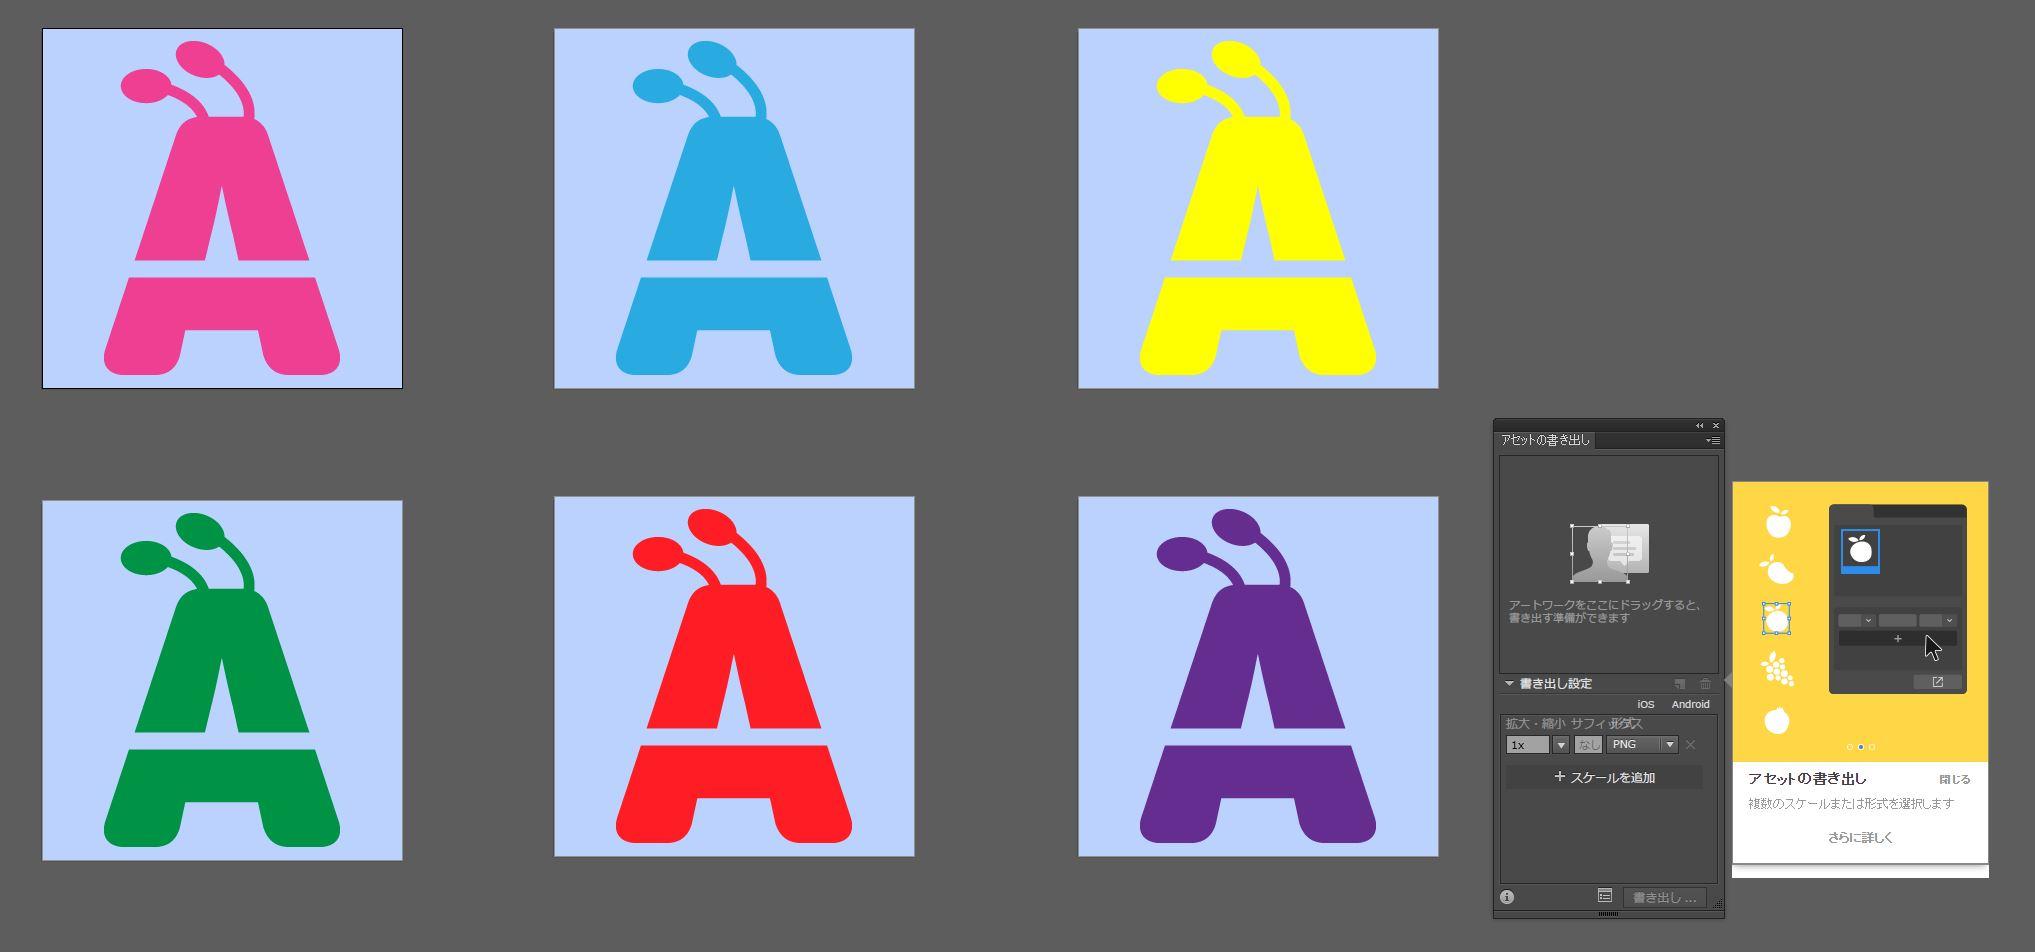 Adobe Illustrator CC (2015.3)